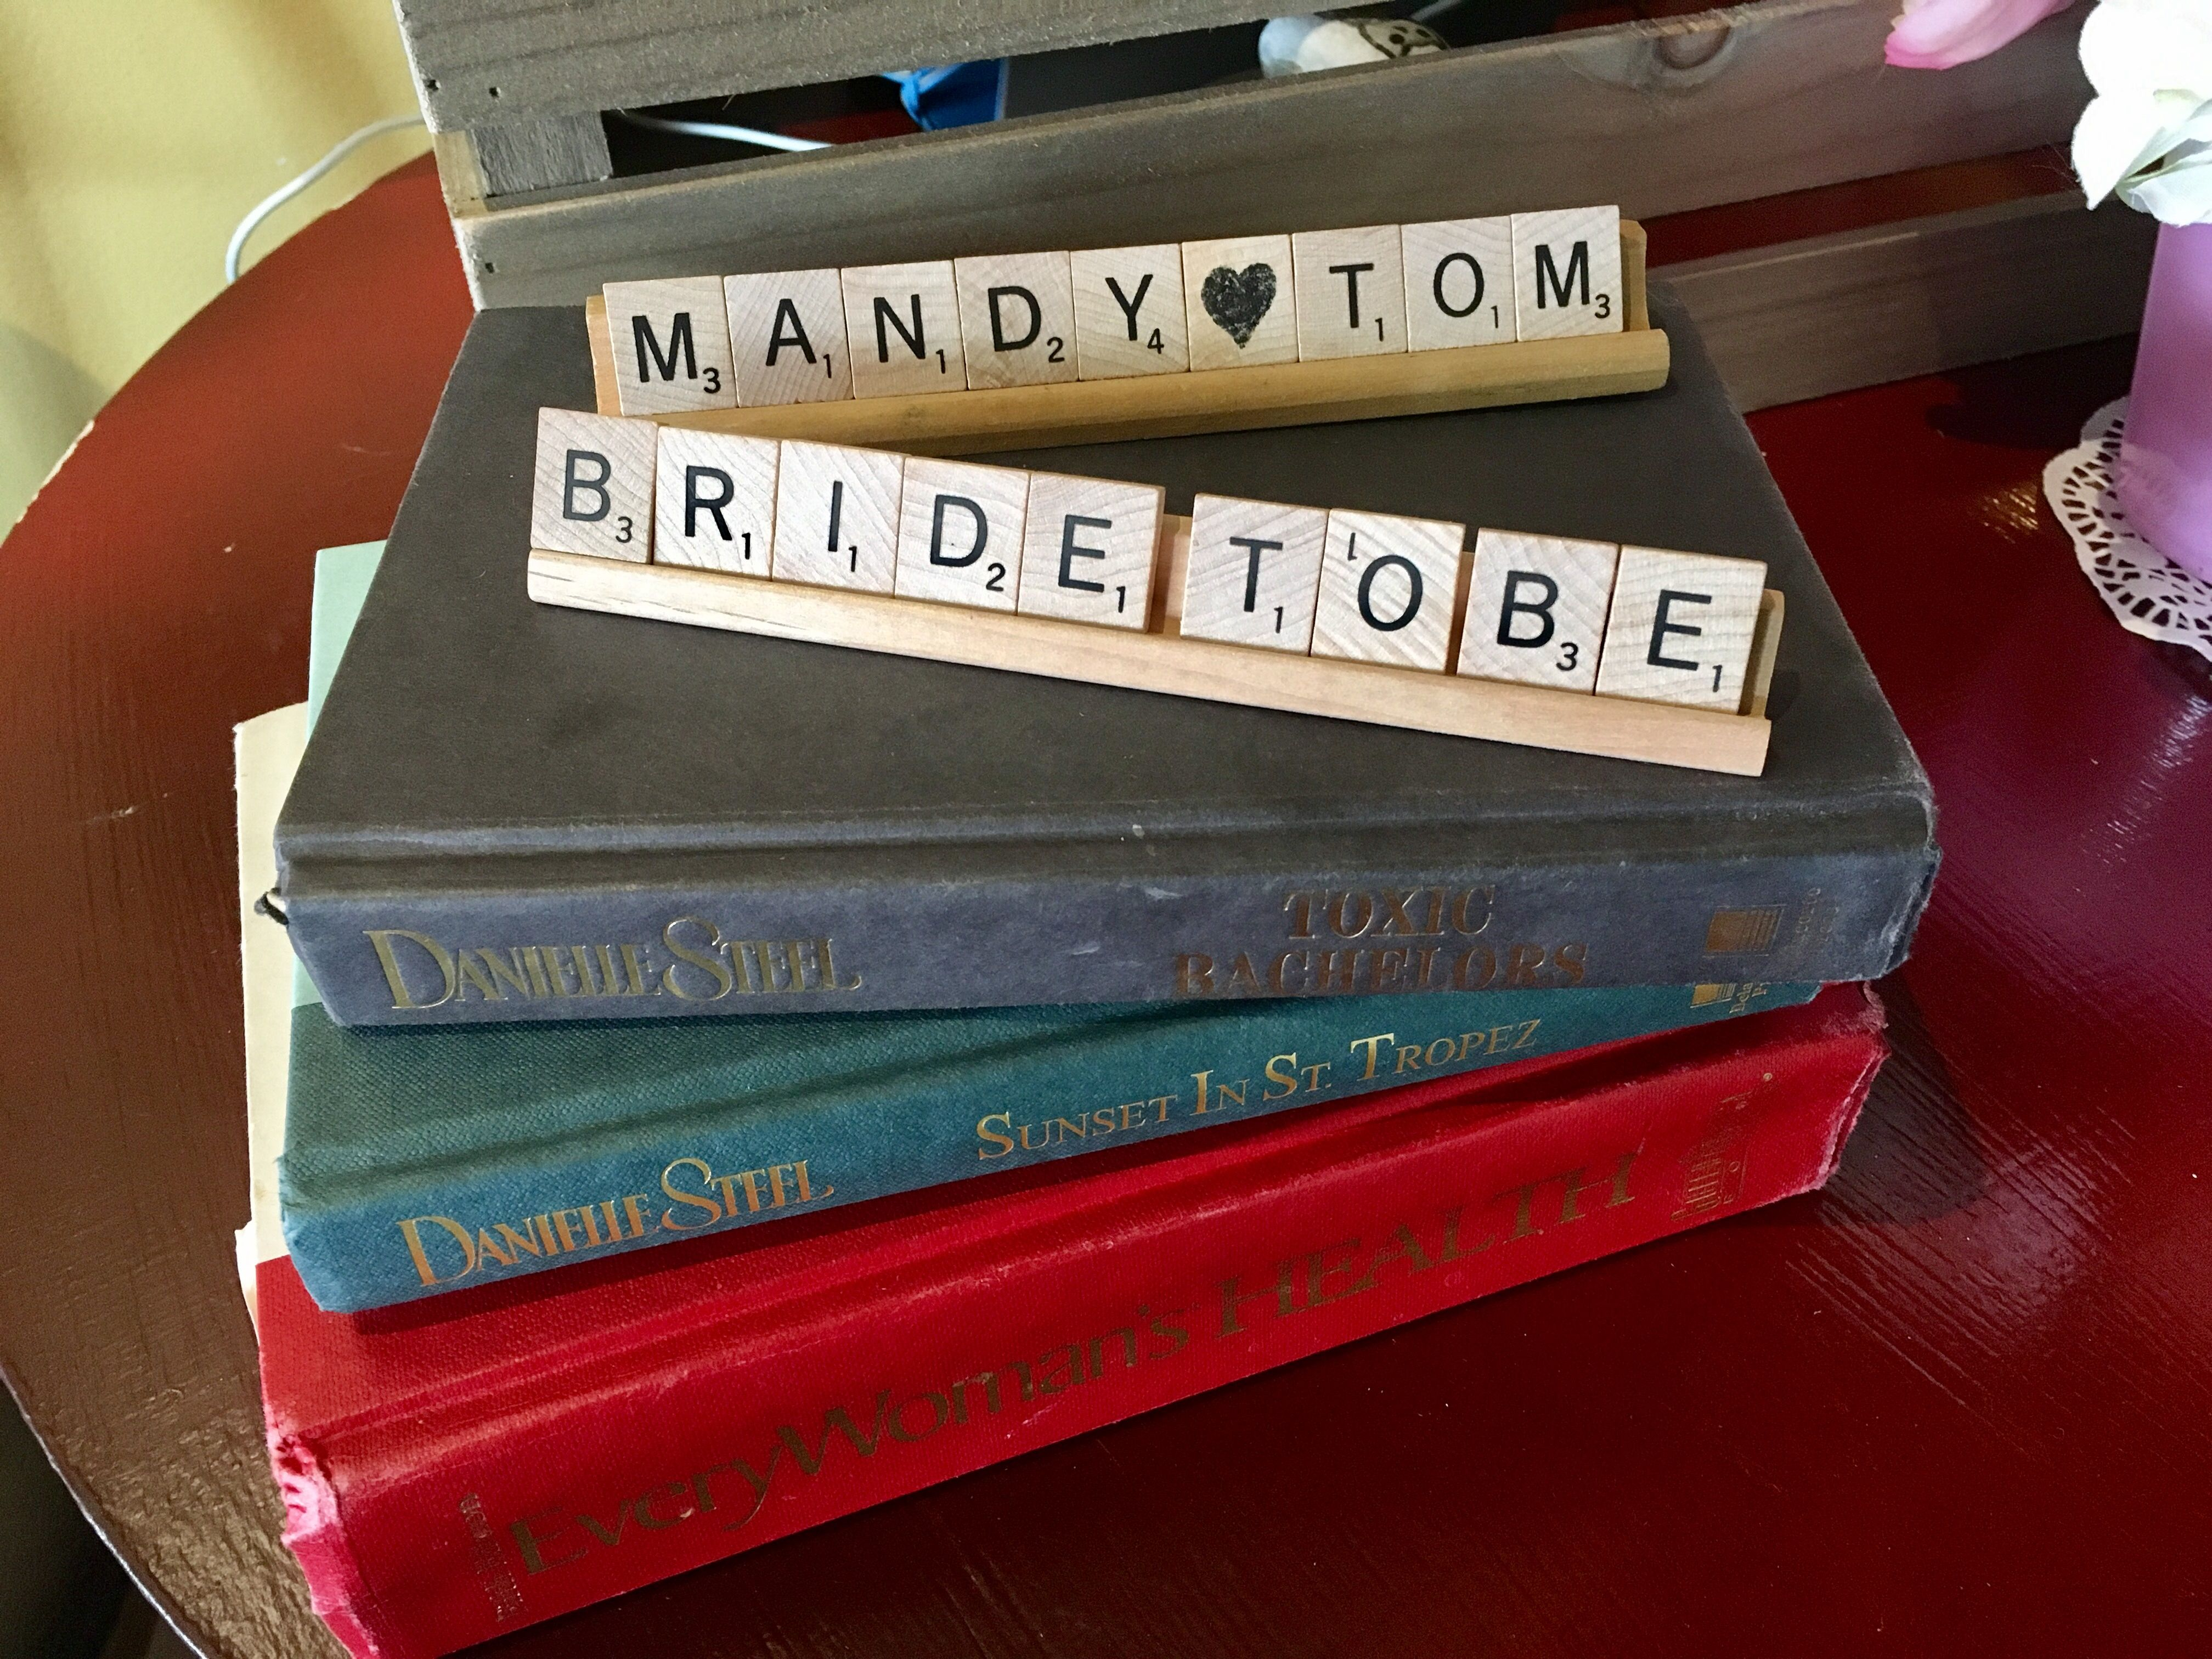 Scrabble letters and books bridal shower decor